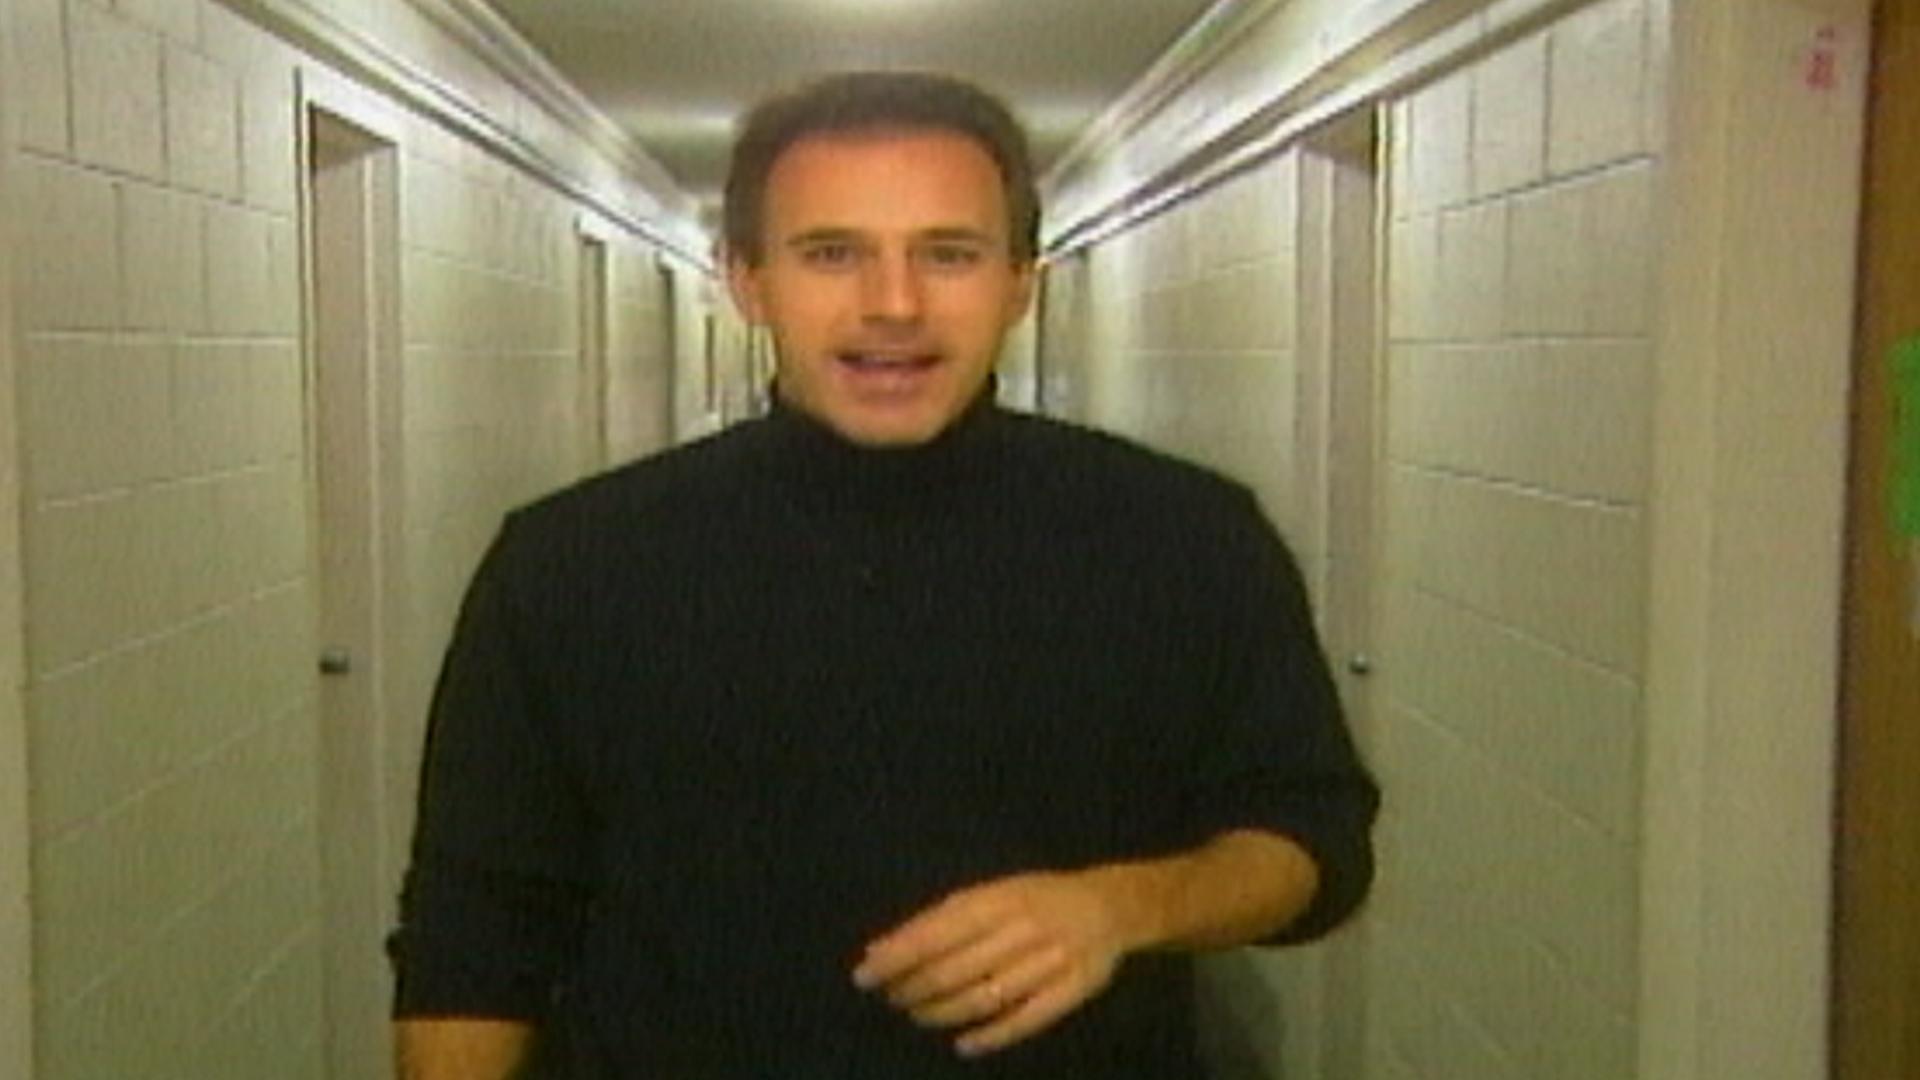 Ohio University Matt Lauer >> Flashback! Matt Lauer goes back to college - TODAY.com